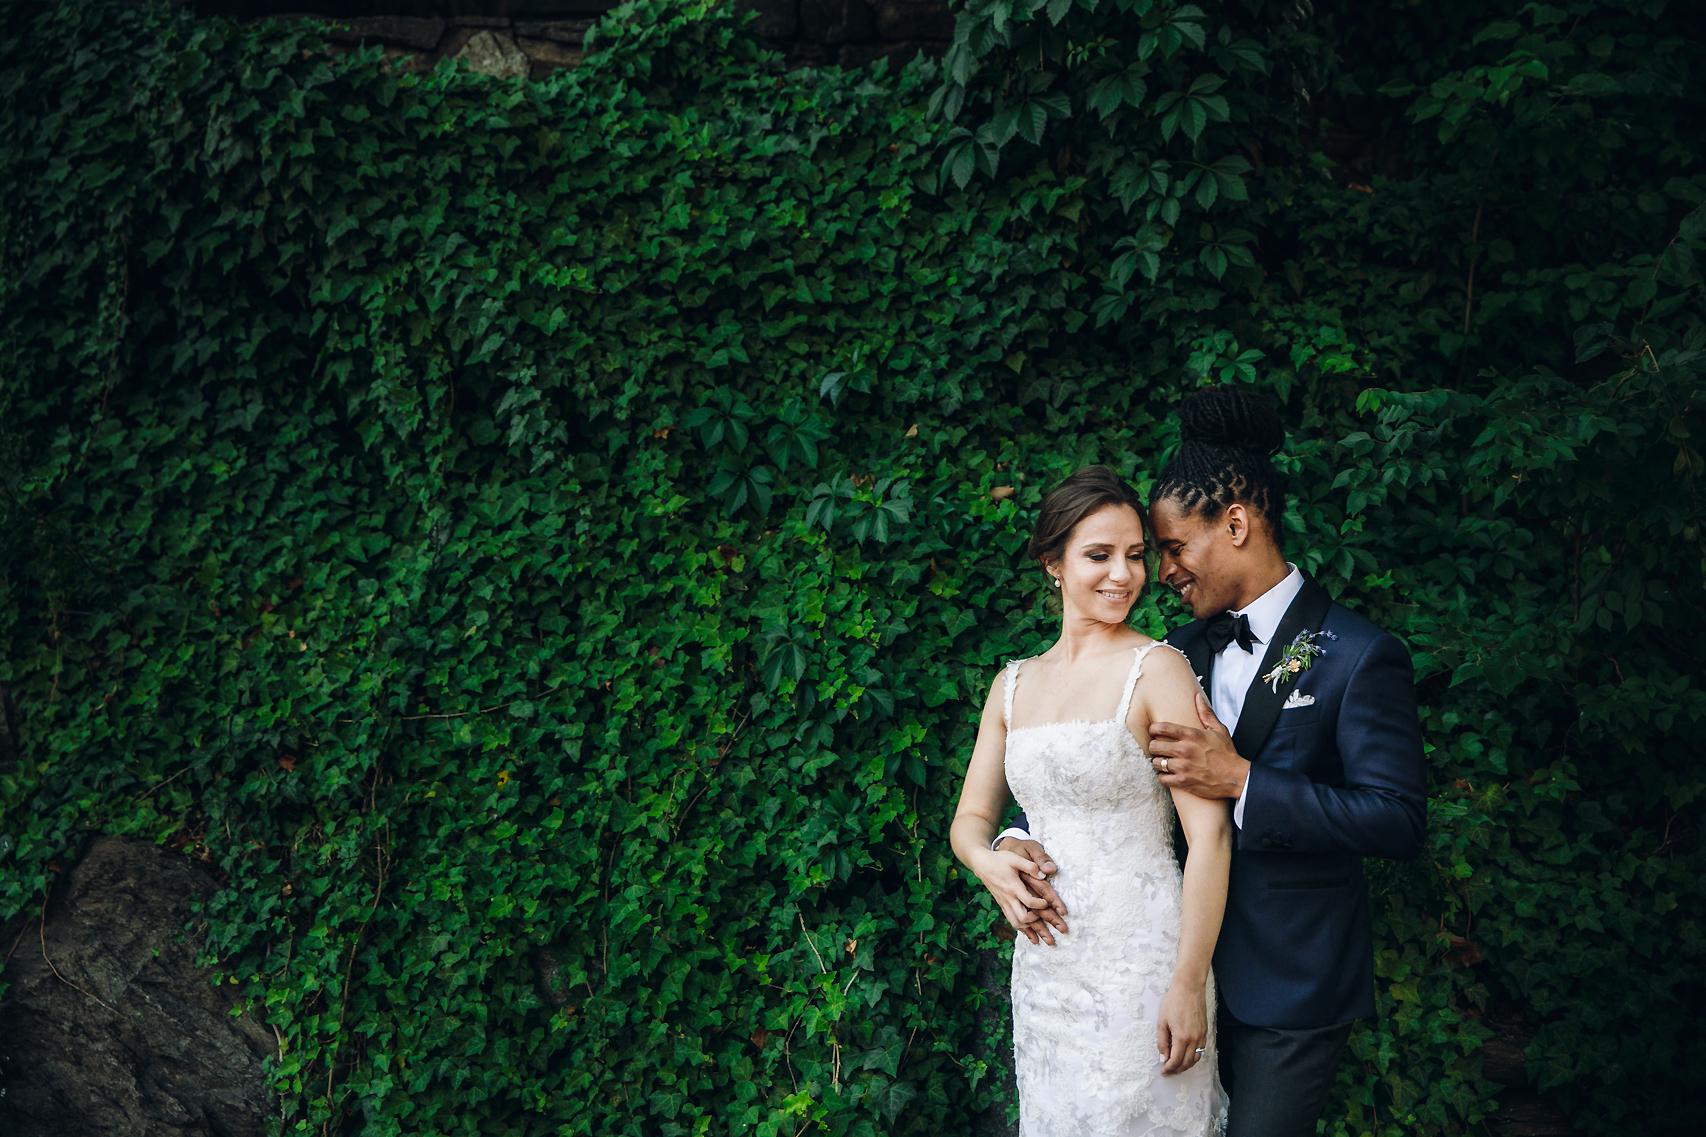 Bride and groom in Washington DC wedding